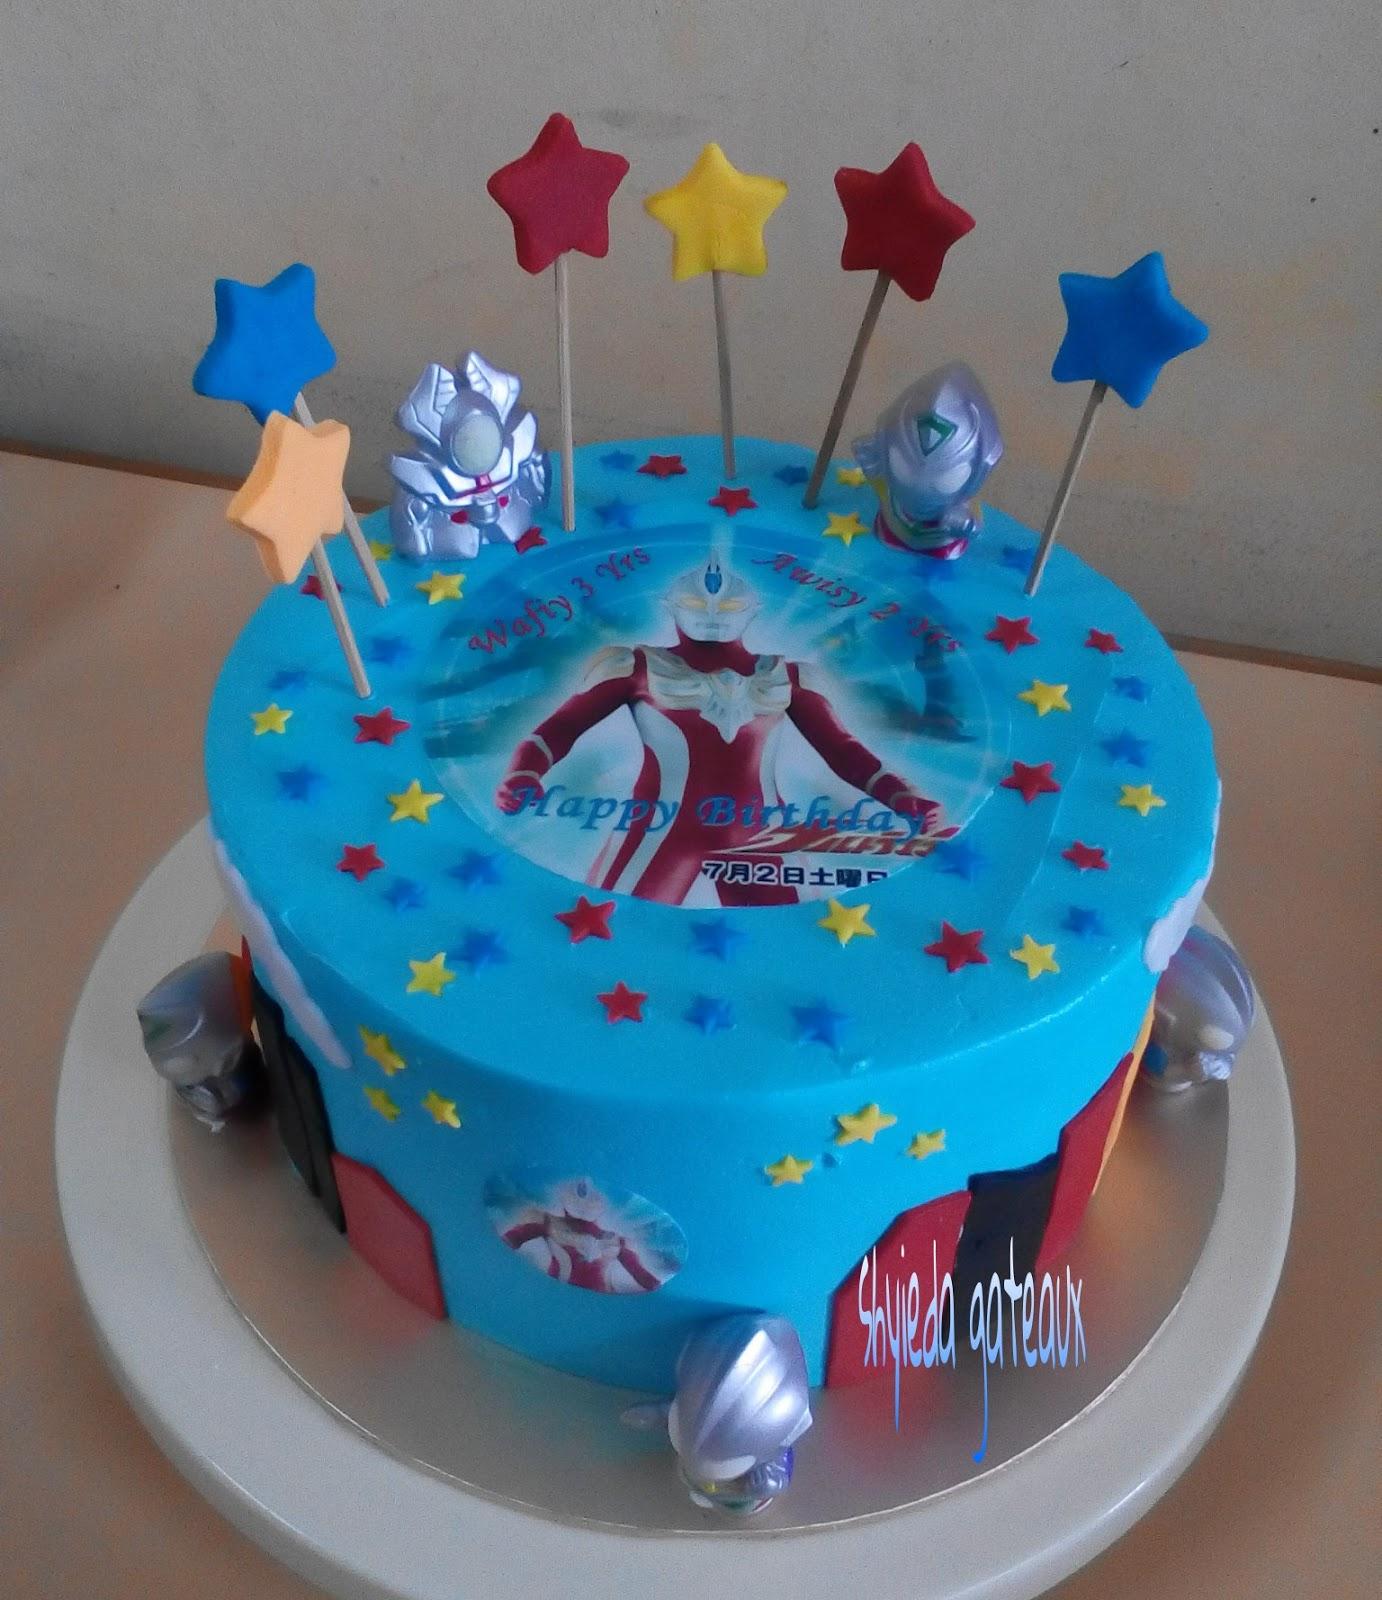 Ultraman Birthday Cake Design : Shyieda Gateaux Homemade Melaka: Ultraman cake